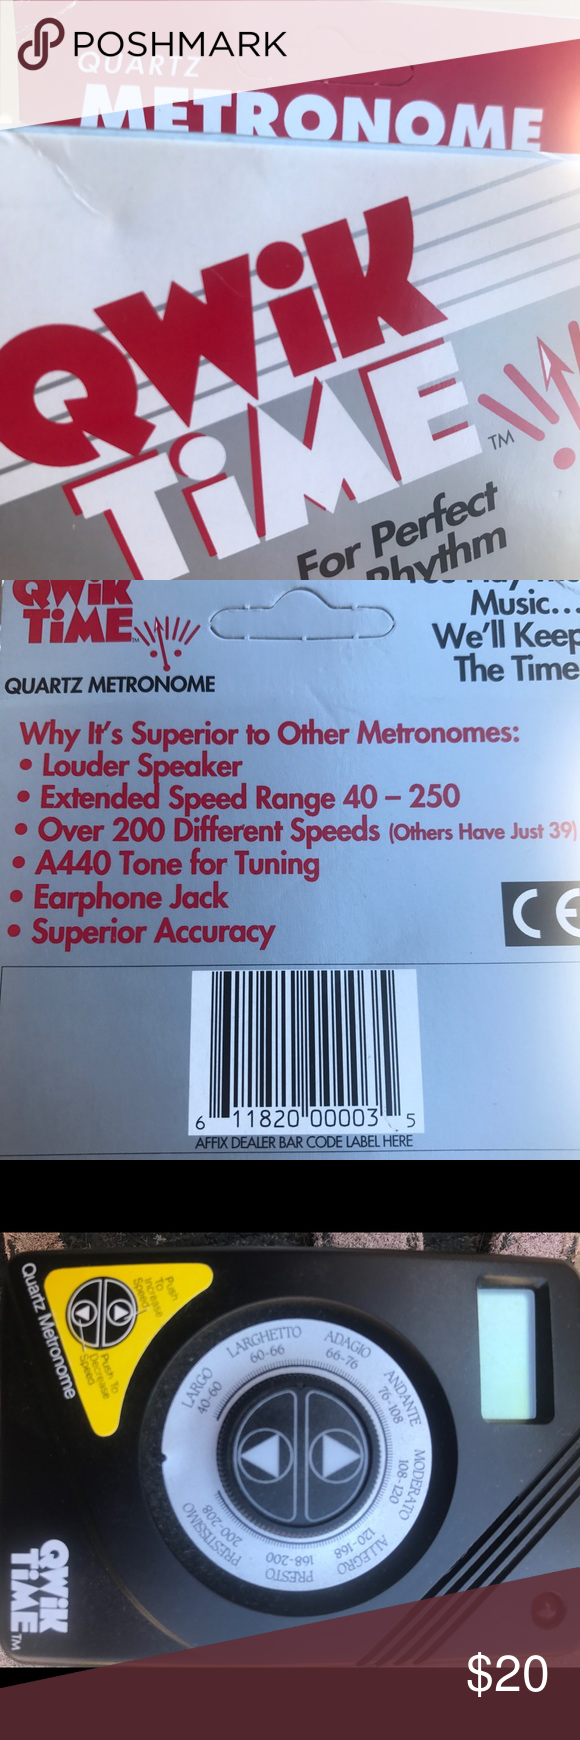 NIB Quartz metronome qwik time for musicians music Quartz